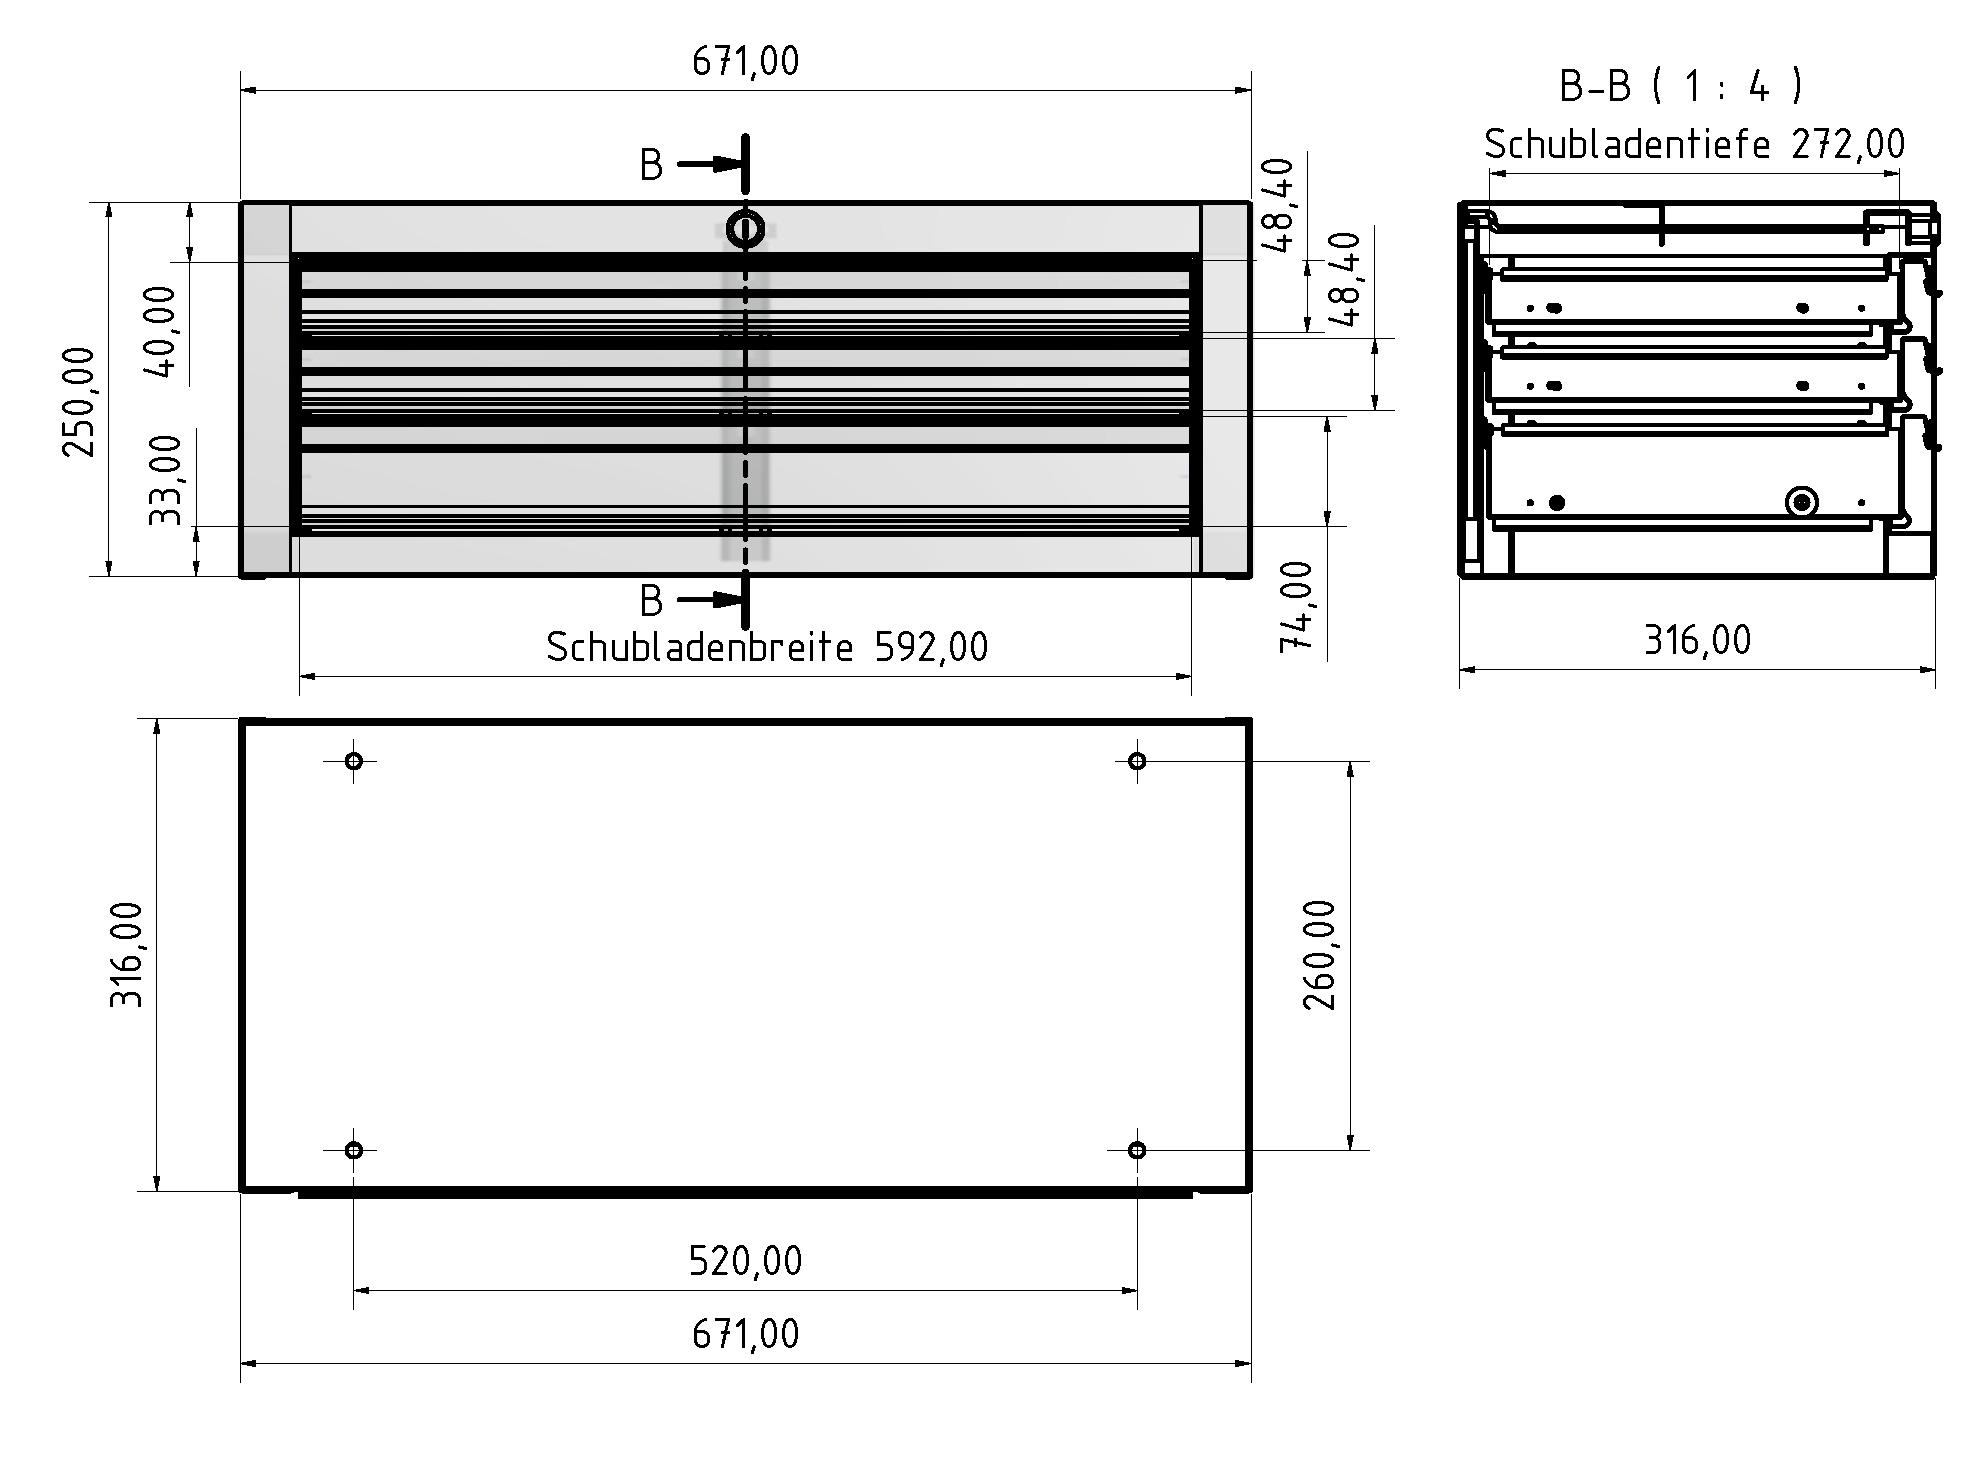 Schubladenhängeblock 3  B 670 H 250 T 316